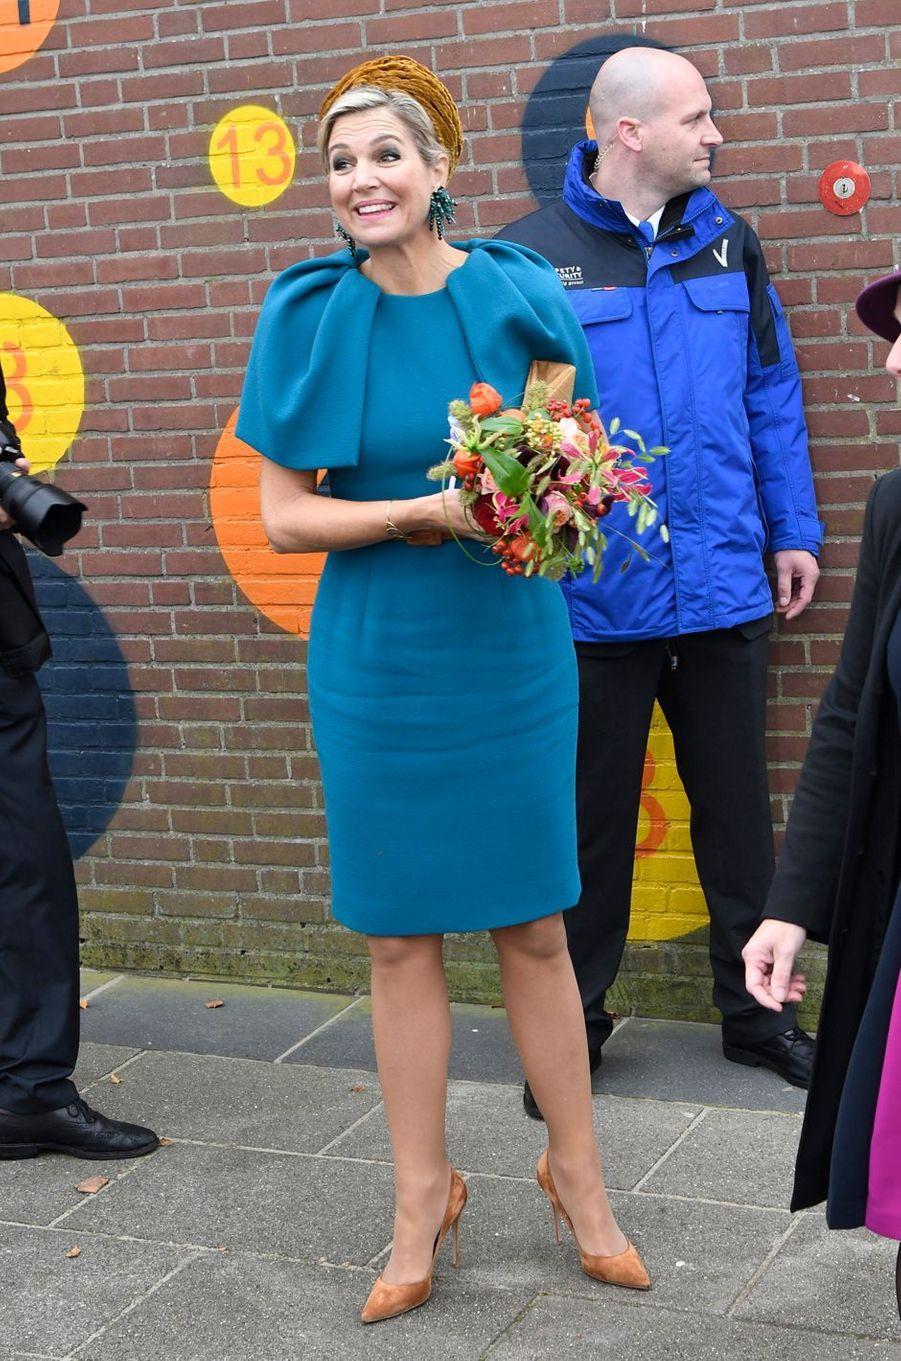 La reine Maxima des Pays-Bas en visite dans la région de Noordoost Twente, le 27 octobre 2016